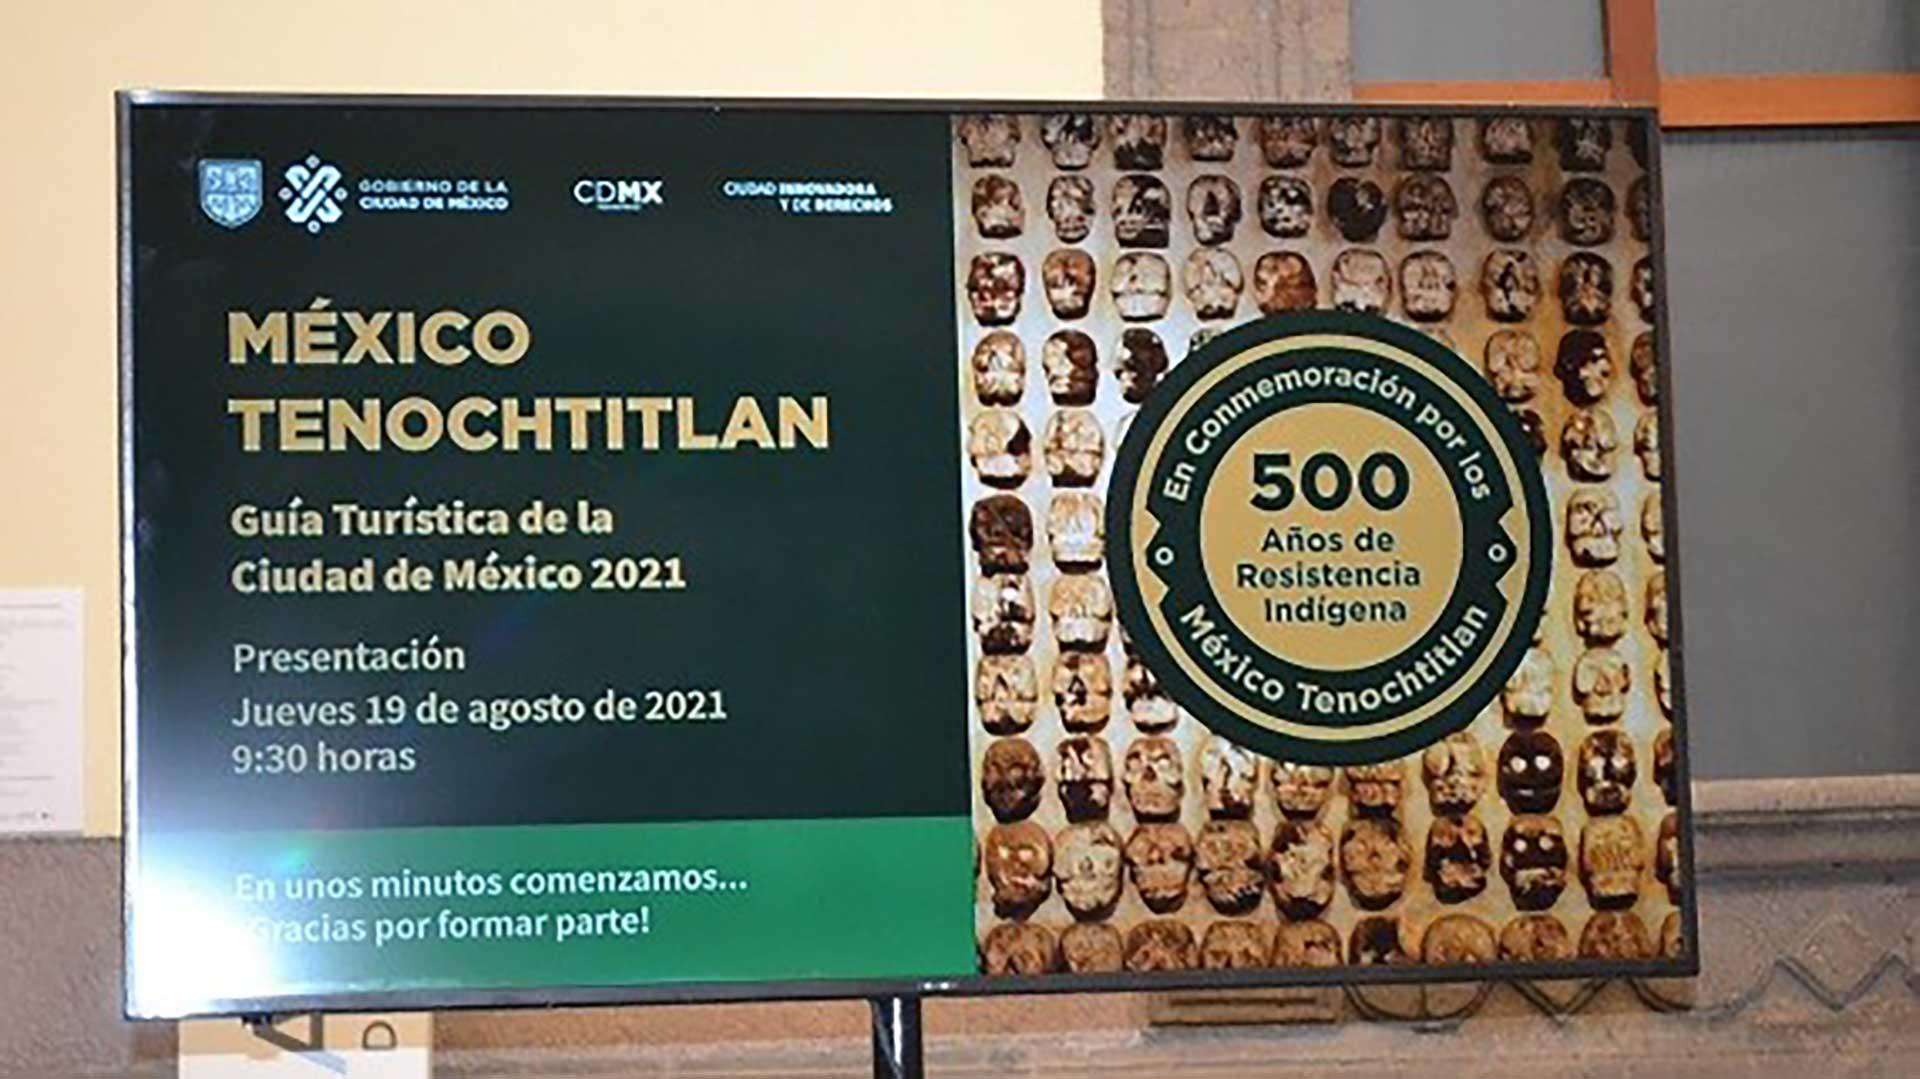 Guia-Mexico-Tenochtitlan-Presentacion